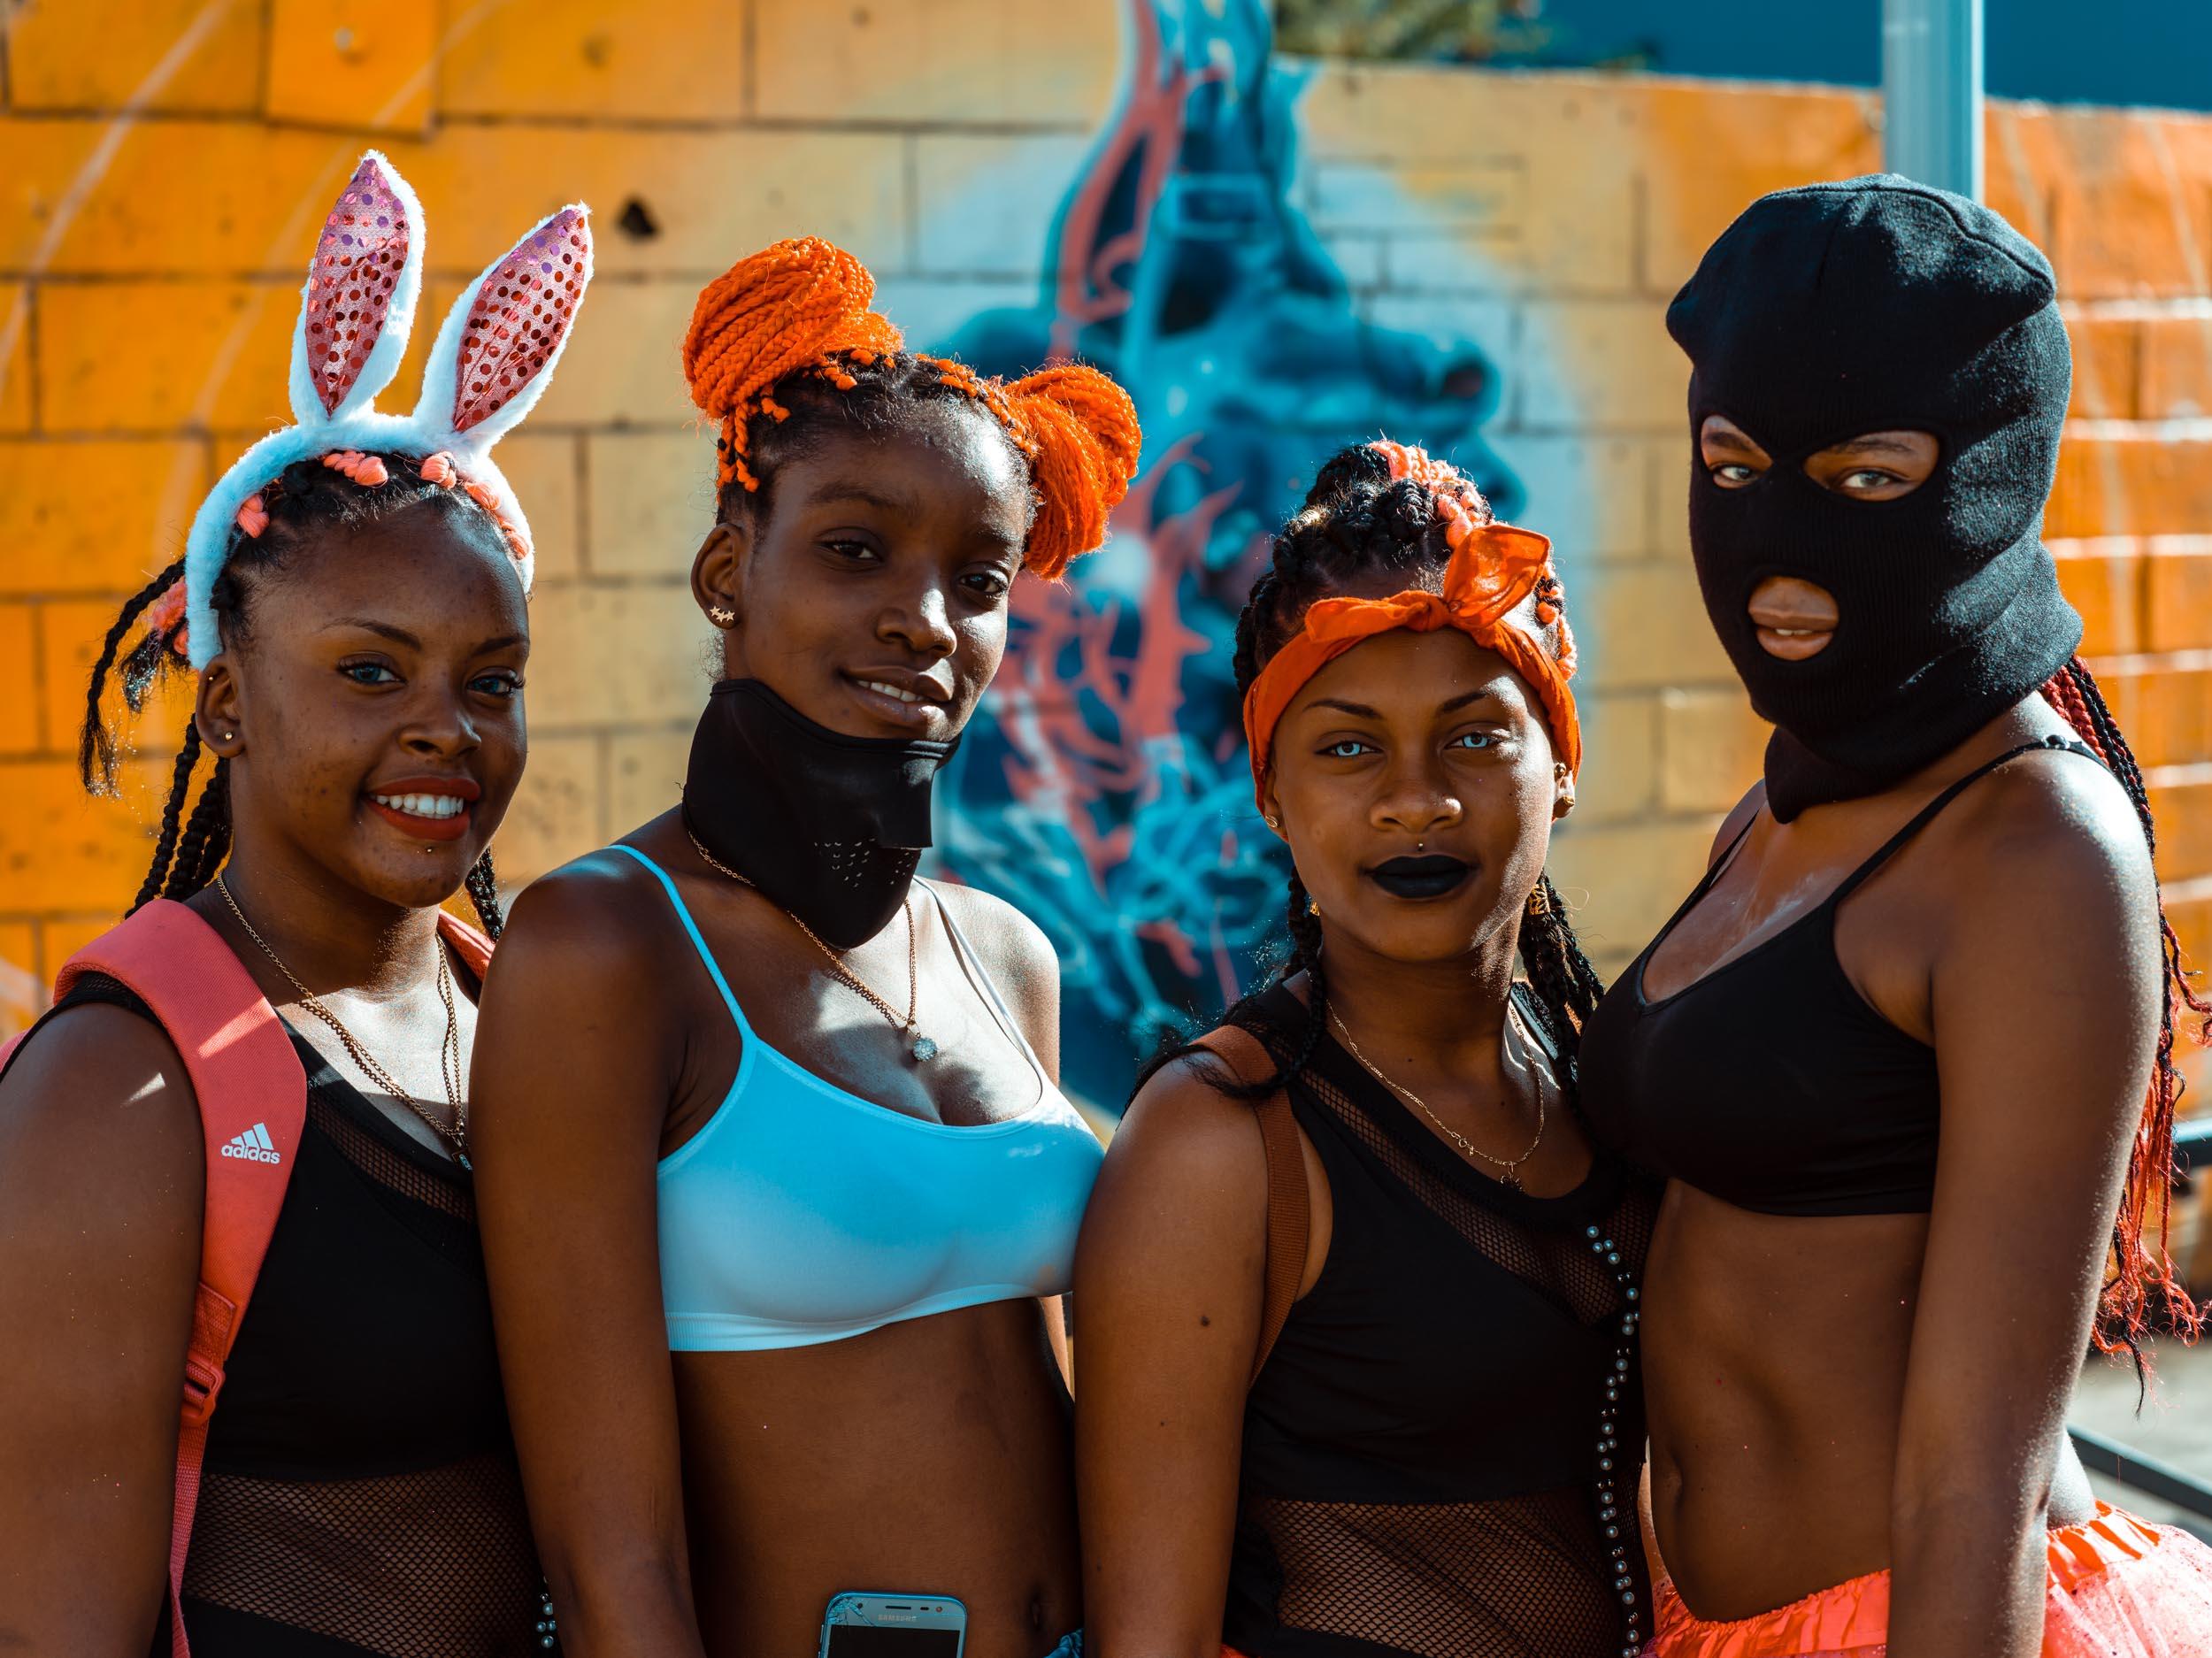 180211_SK_Martinique-14.jpg